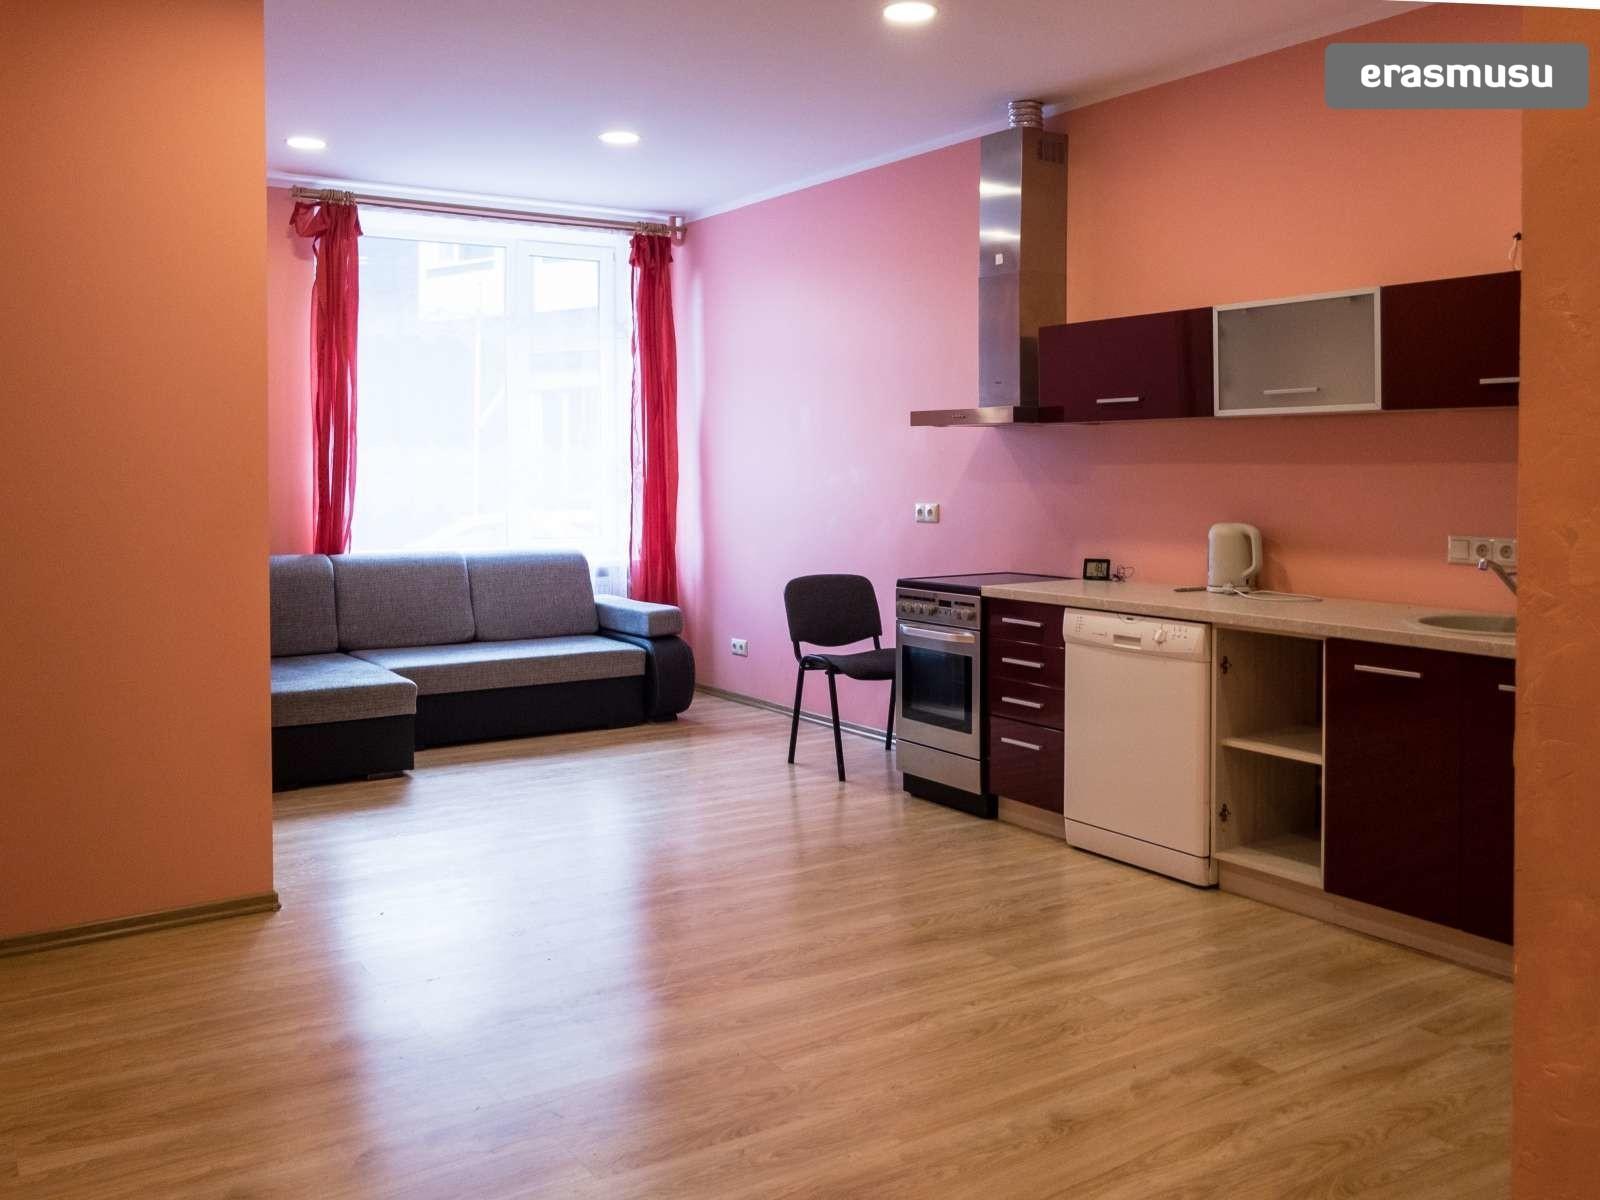 Practical 1-bedroom apartment for rent near Rīga Stradiņš ...